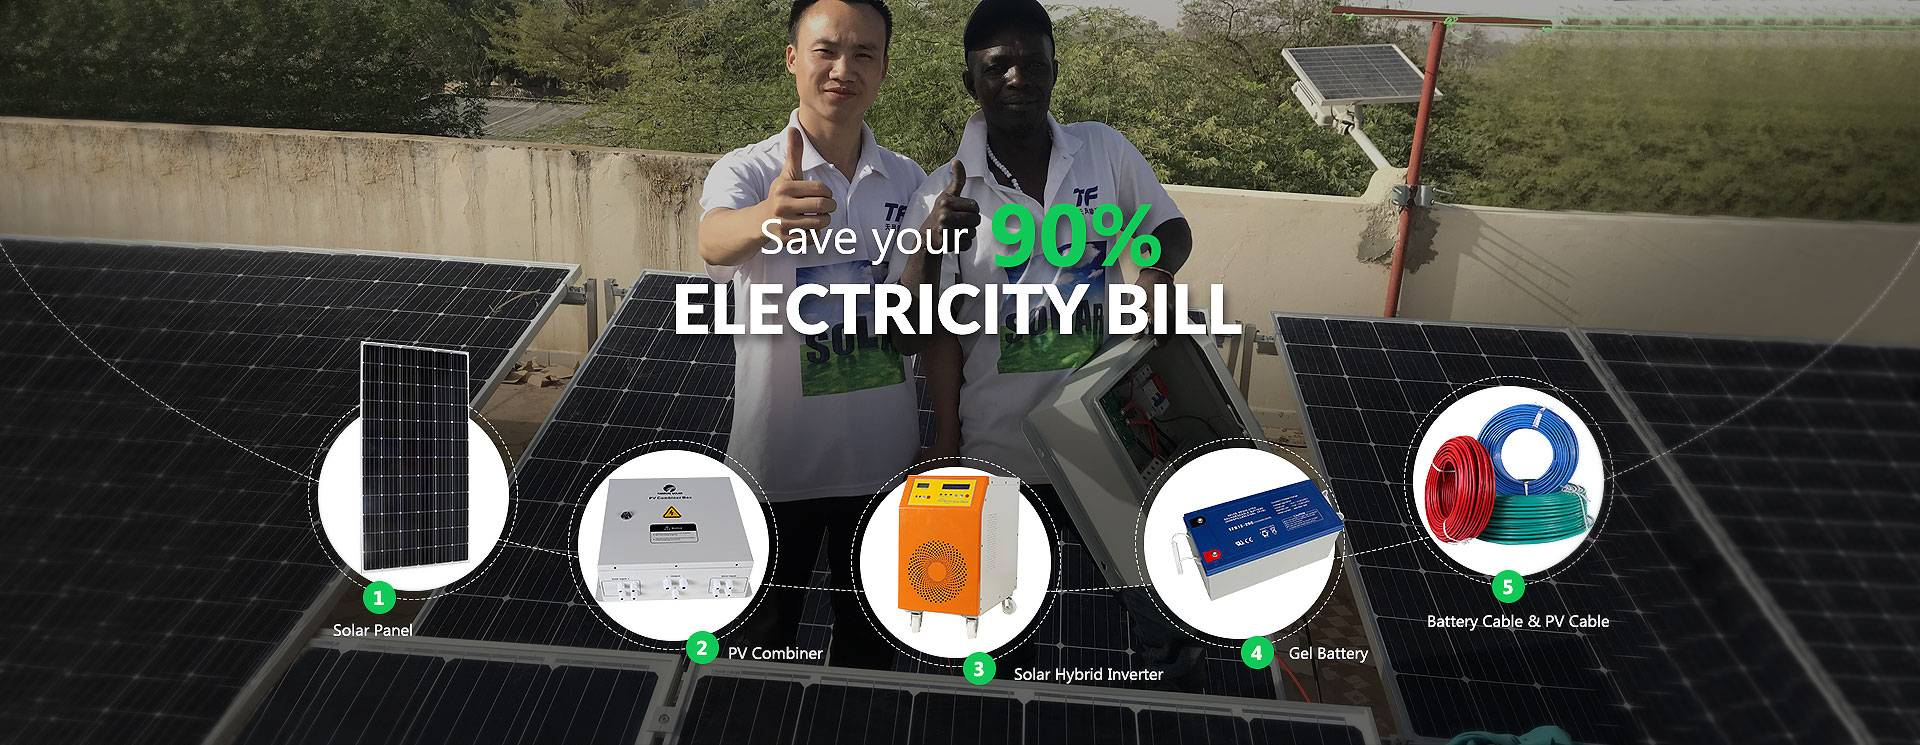 Foshan Tanfon Energy Technology Co.,Ltd